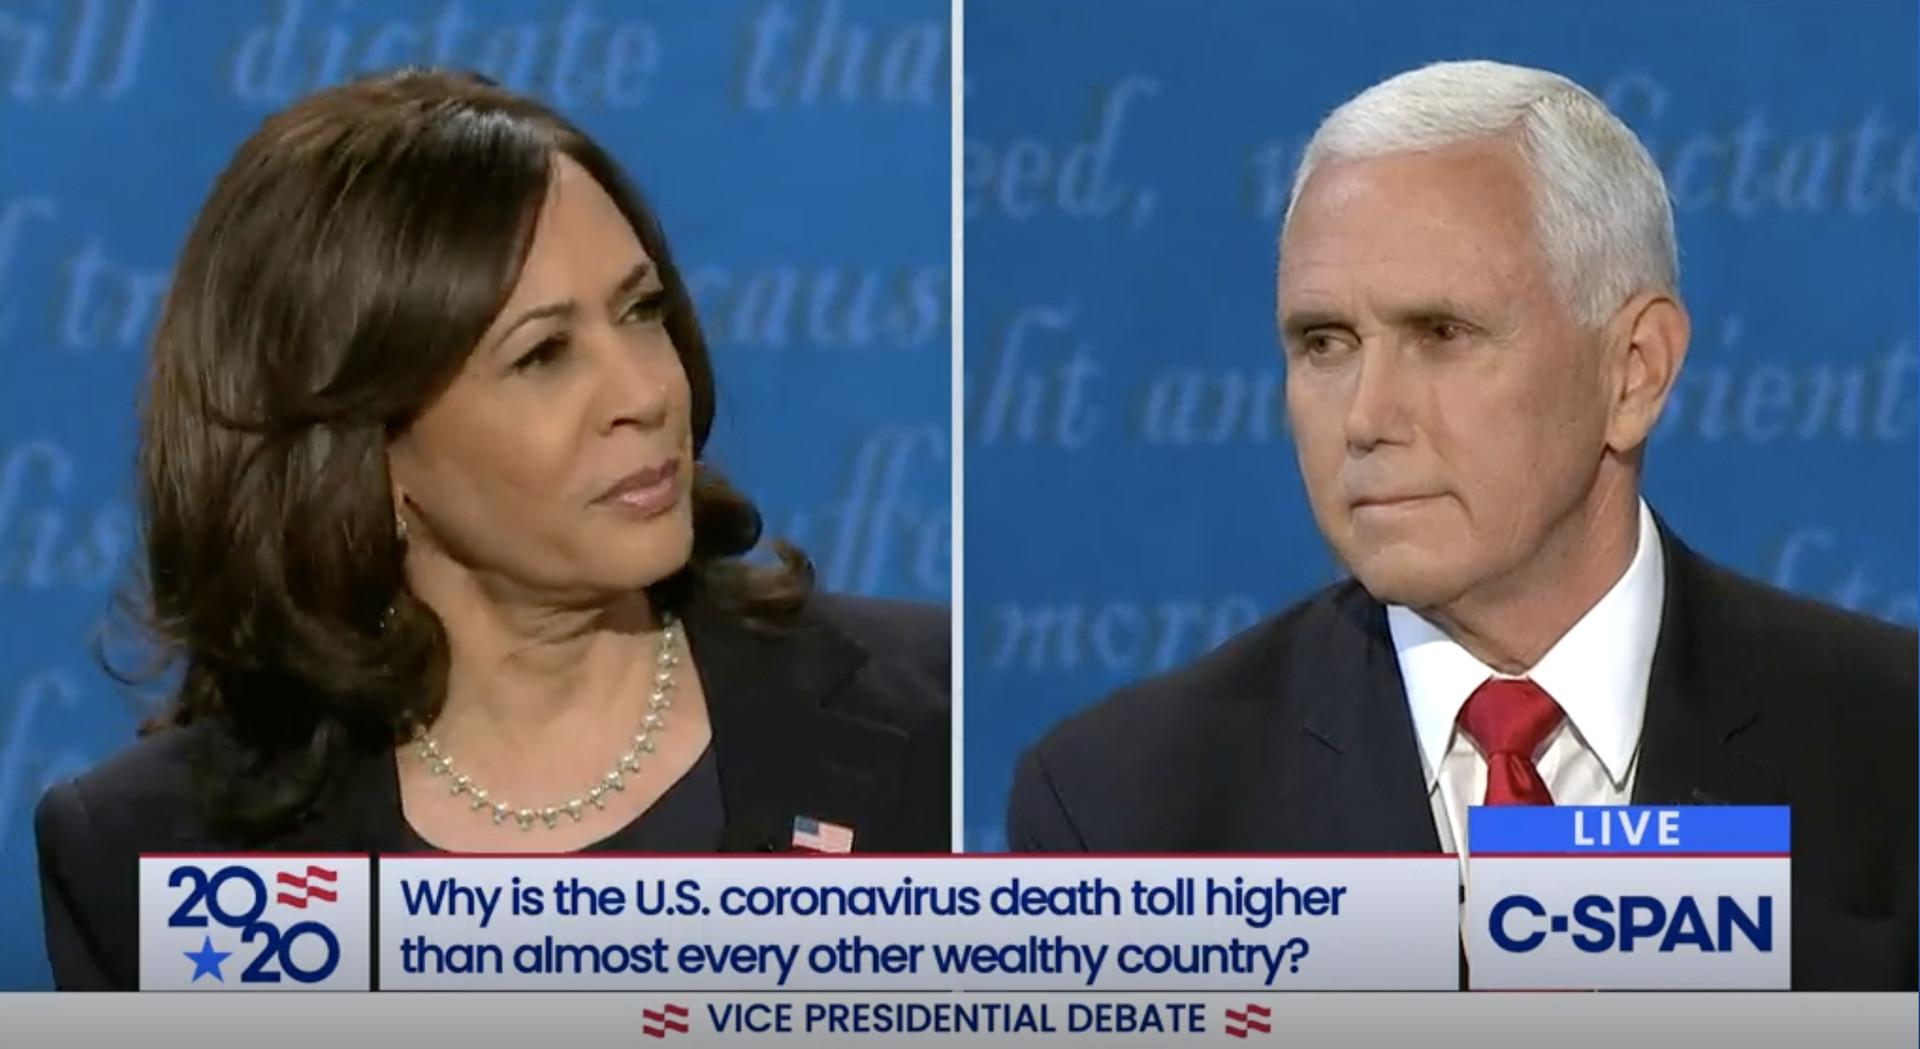 Screenshot of debate between Kamala Harris and Mike Pence